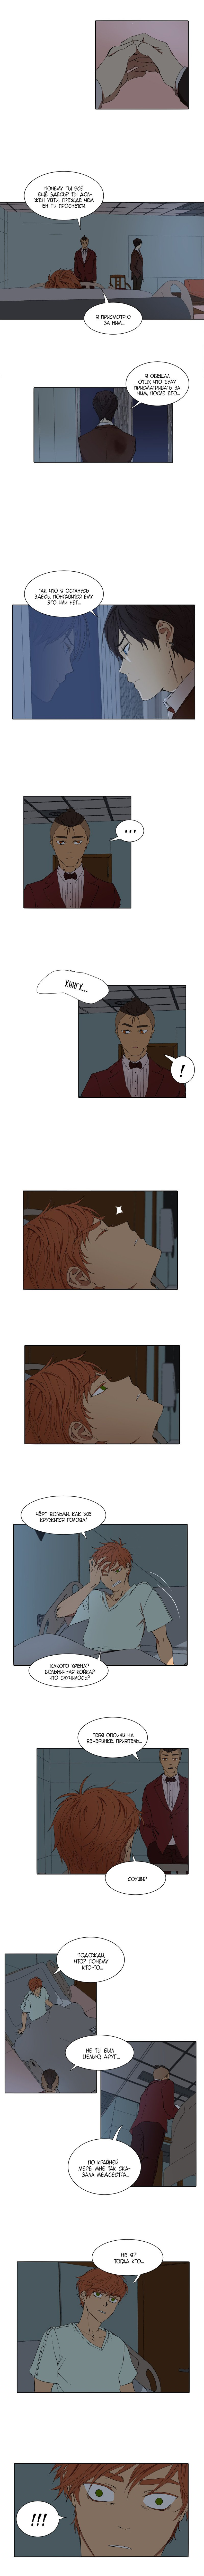 Манга Я люблю Ю / I love Yoo  - Том 1 Глава 9 Страница 4